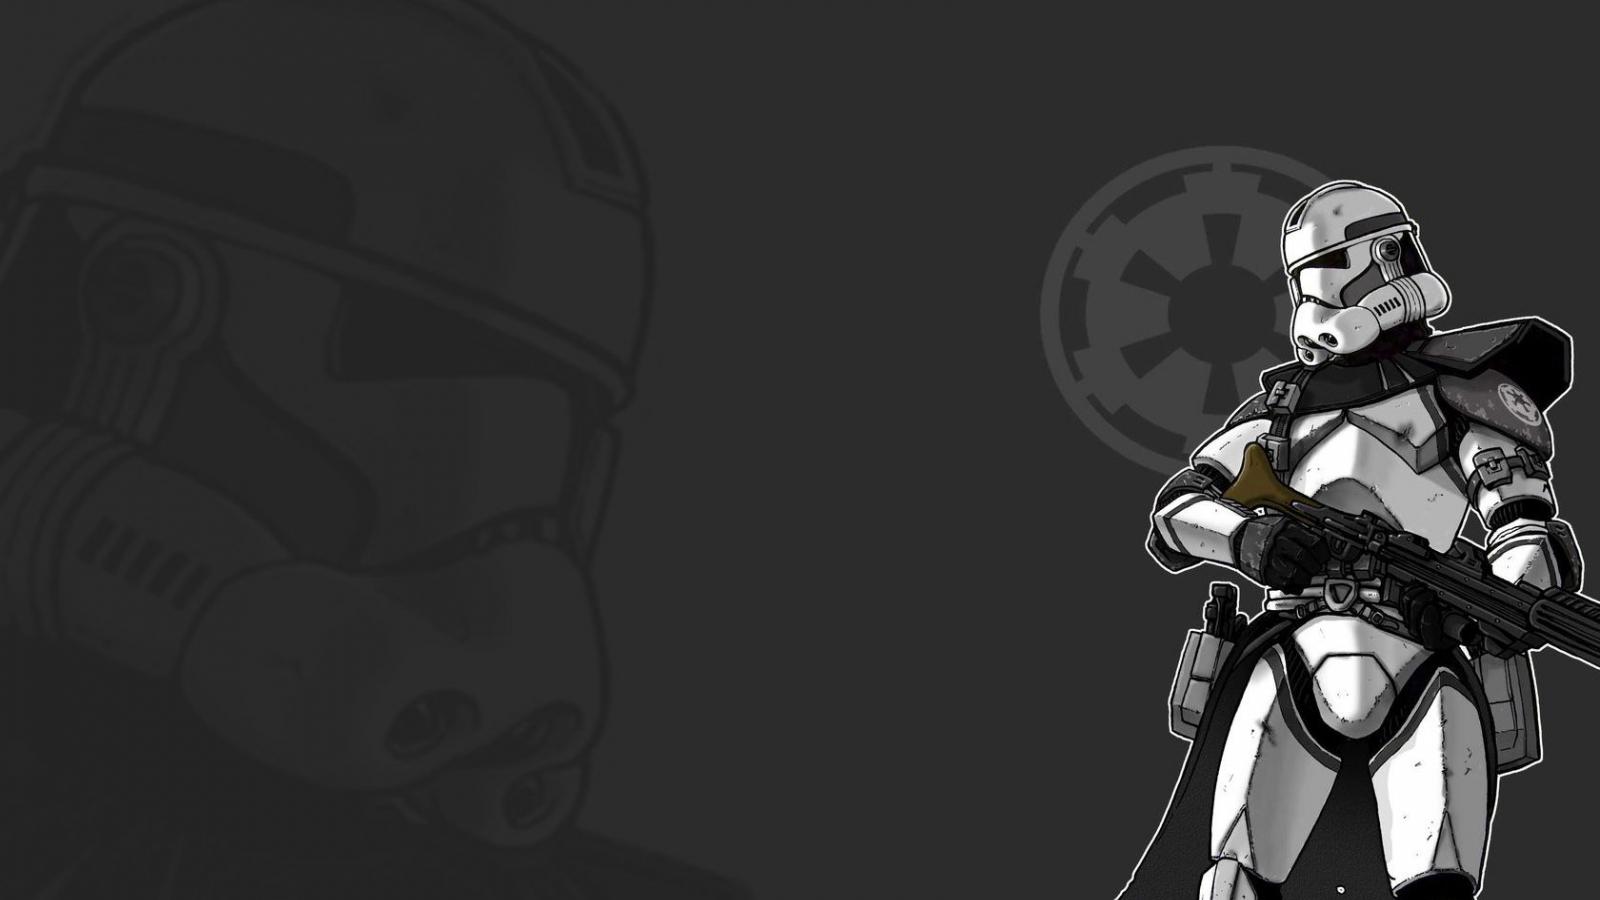 Free Download Star Wars The Clone Wars Clone Troopers Wallpaper Viewing Gallery 1680x1050 For Your Desktop Mobile Tablet Explore 48 Desktop Wallpaper Star Wars Free Star Wars Wallpaper Stars